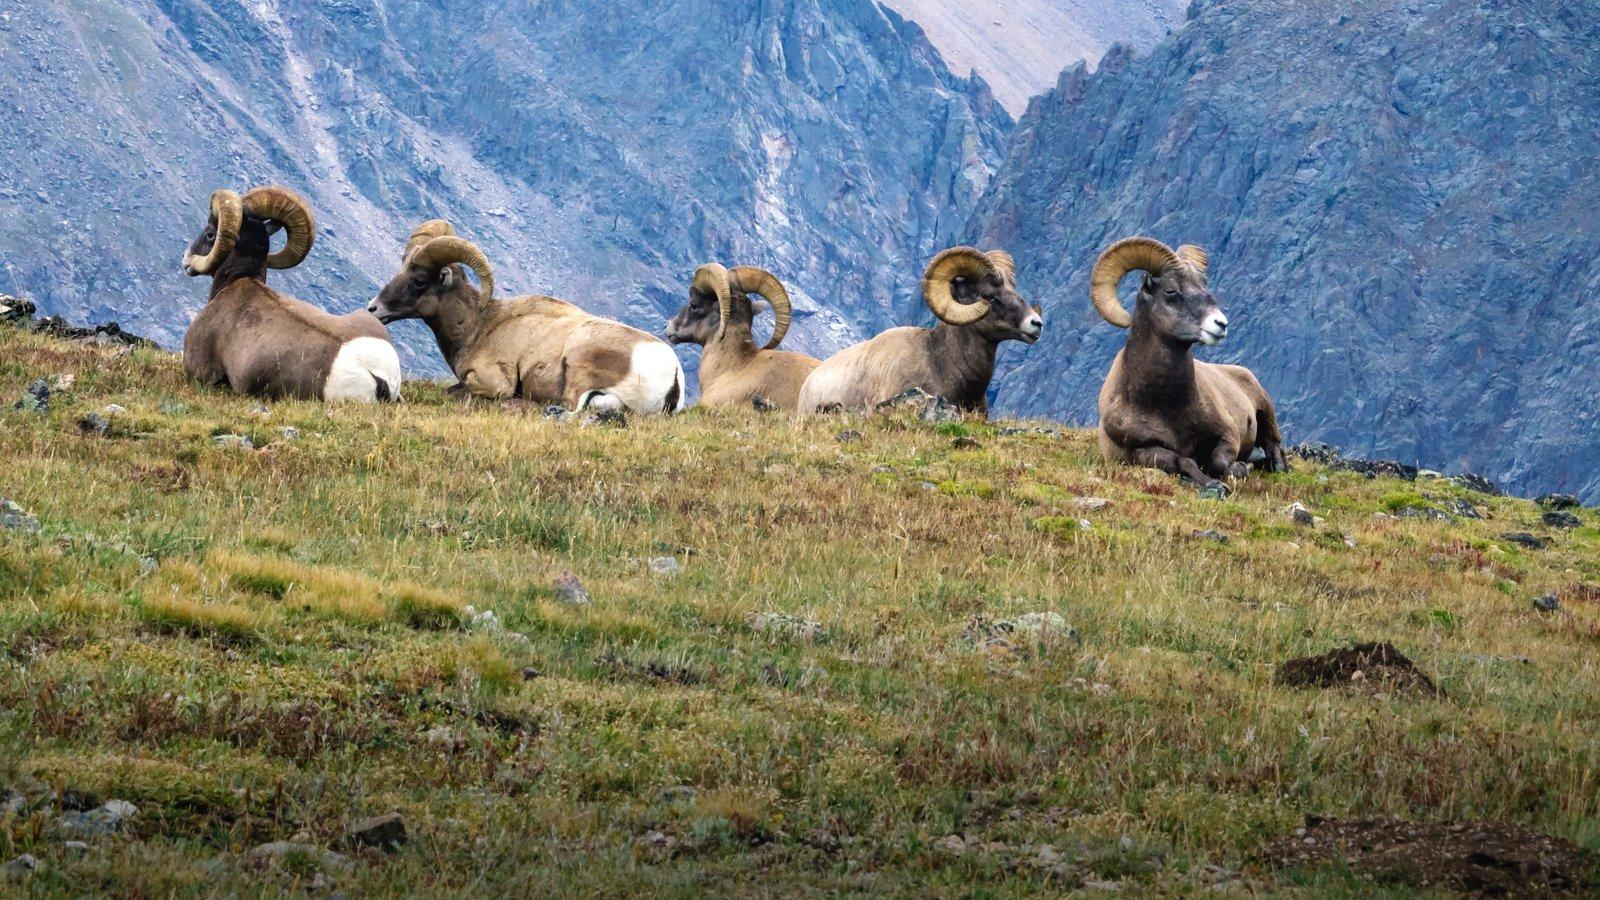 Rocky Mountain National Park que inclui animais terrestres e cenas tranquilas